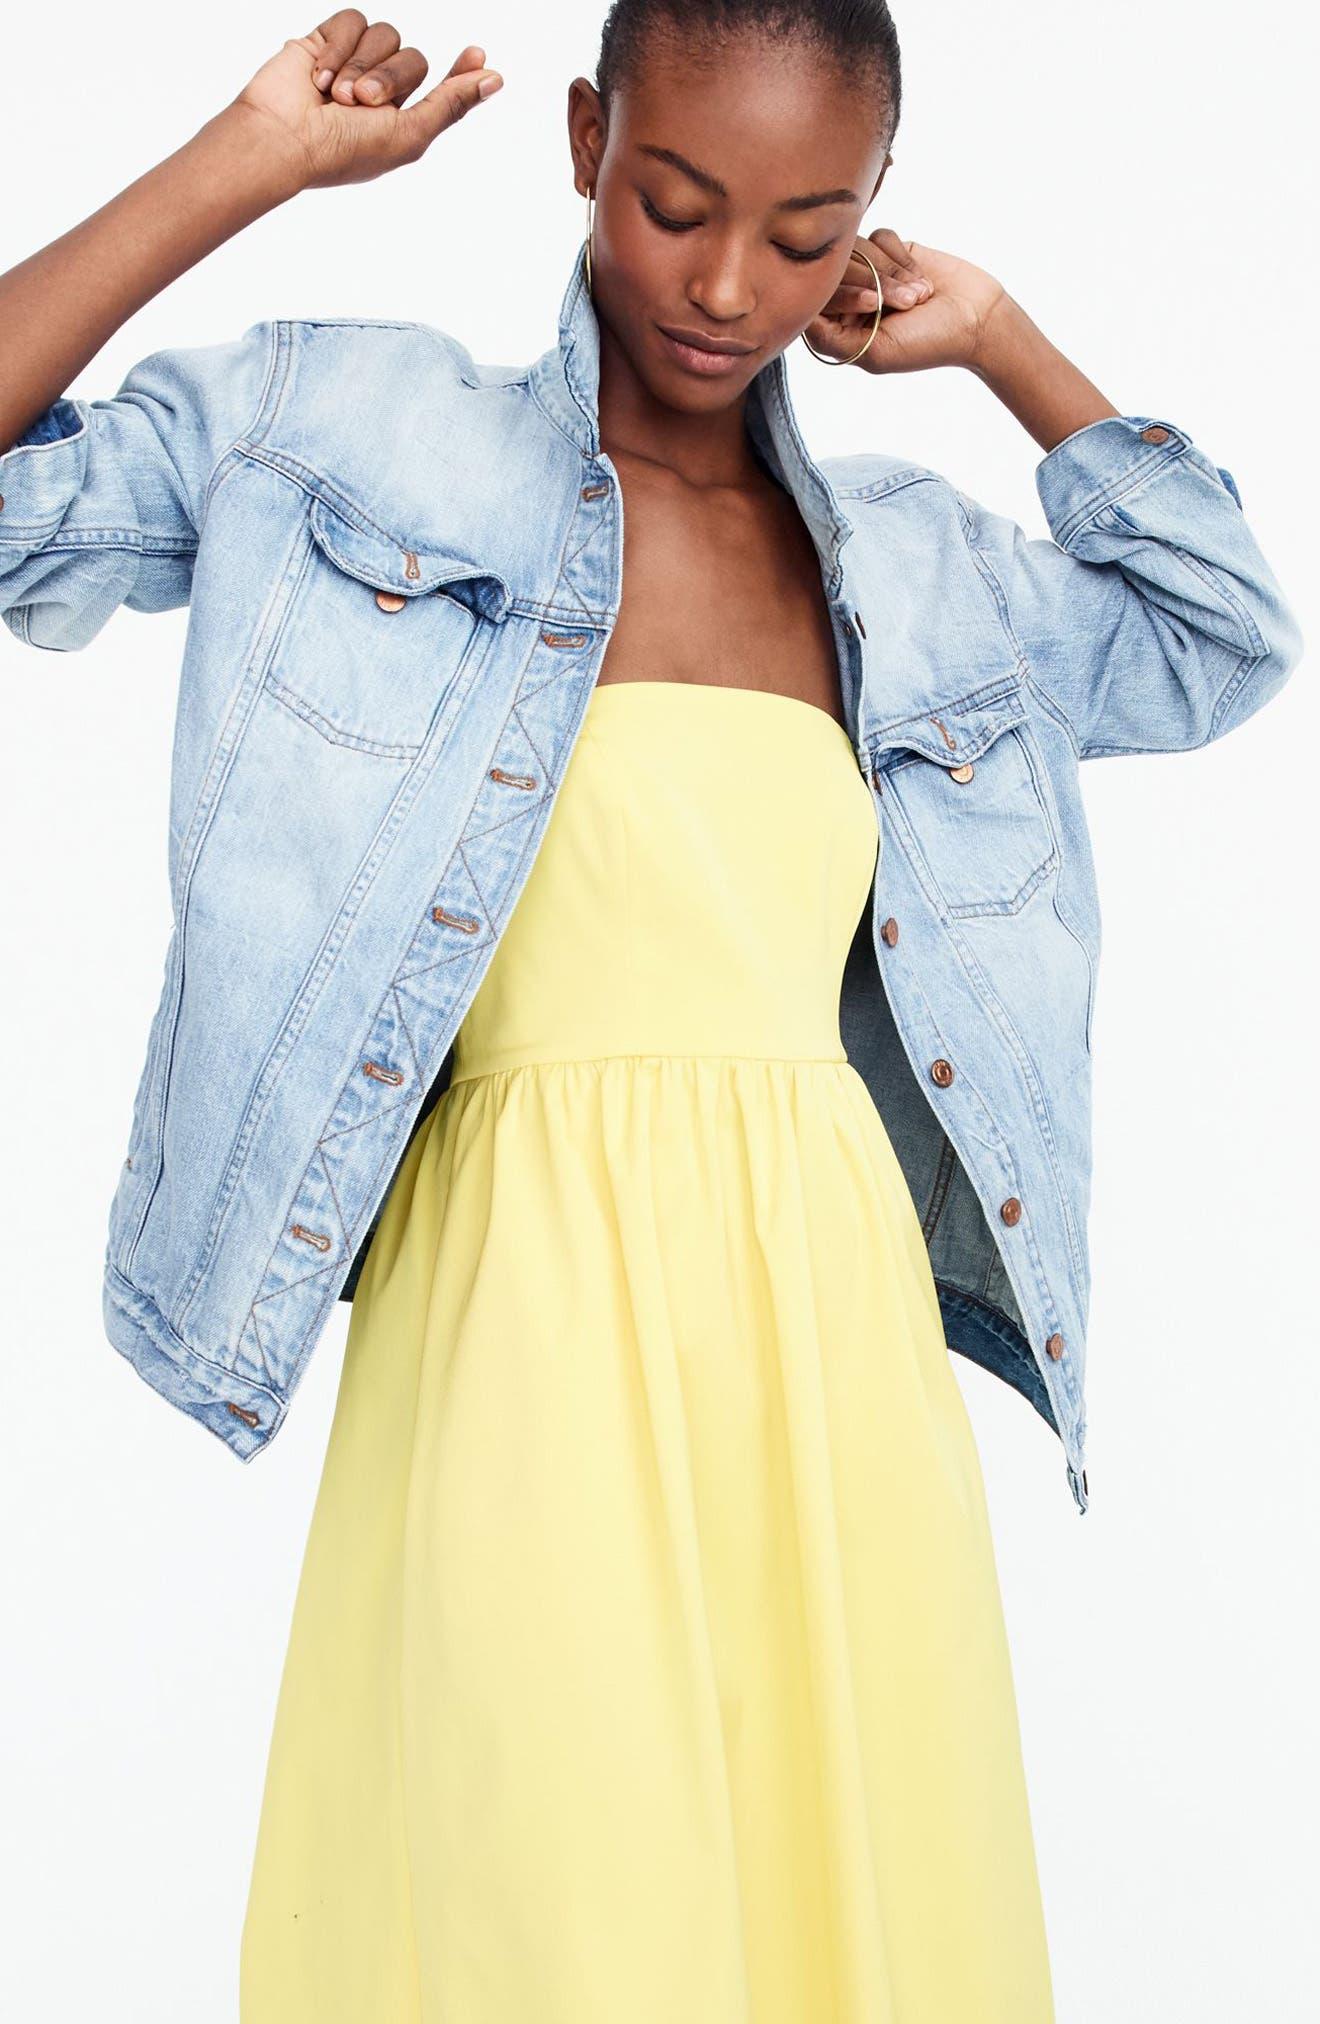 J.Crew Strapless Fit & Flare Dress,                             Alternate thumbnail 2, color,                             Bright Lemon